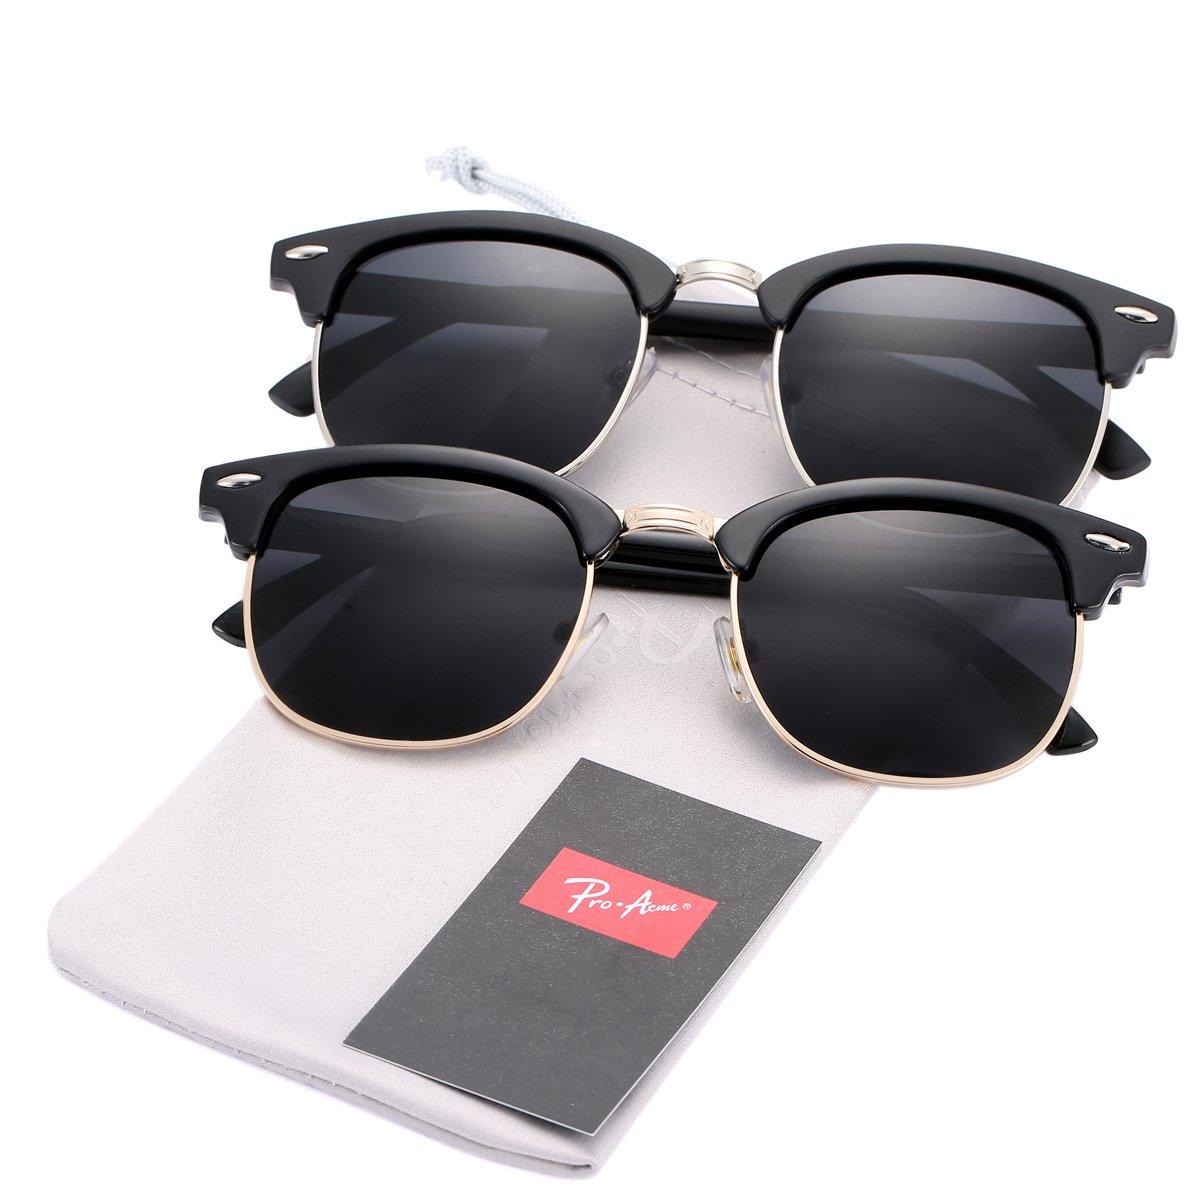 Pro Acme (Pack of 2) Semi Rimless Polarized Clubmaster Sunglasses for Men Women (Bright Black Frame/Black Lens + Matte Black Frame/Black Lens)